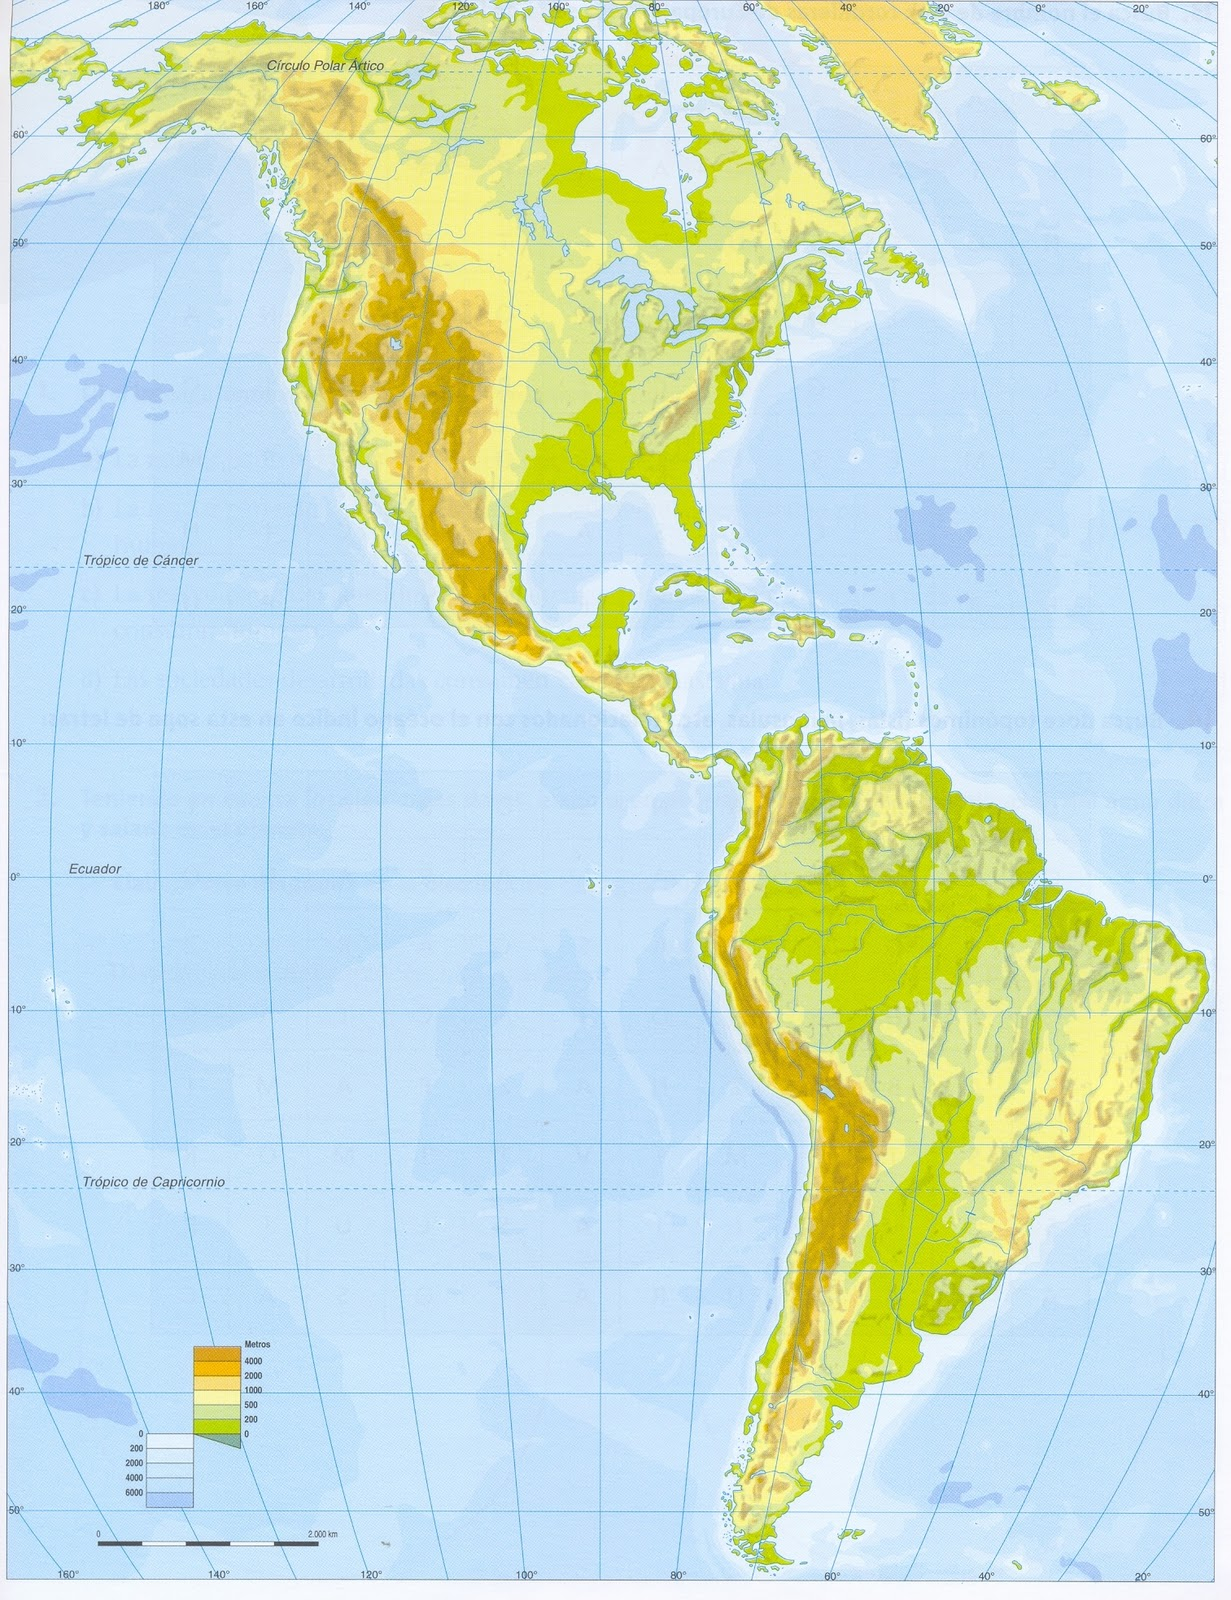 Mapa Fisico De America Mudo.Jose Angel Mapa Fisico De America